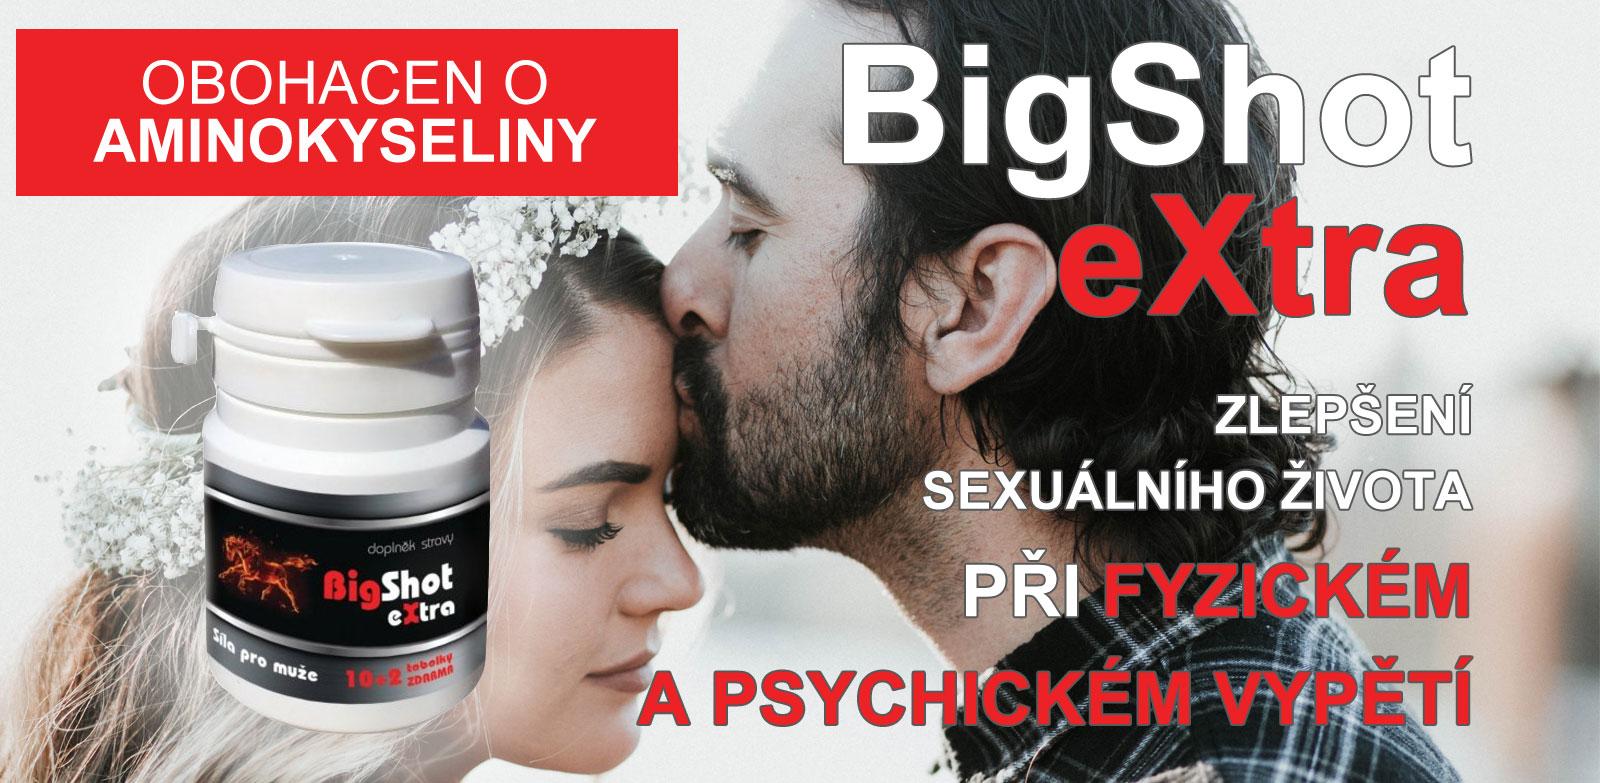 BigShot eXtra